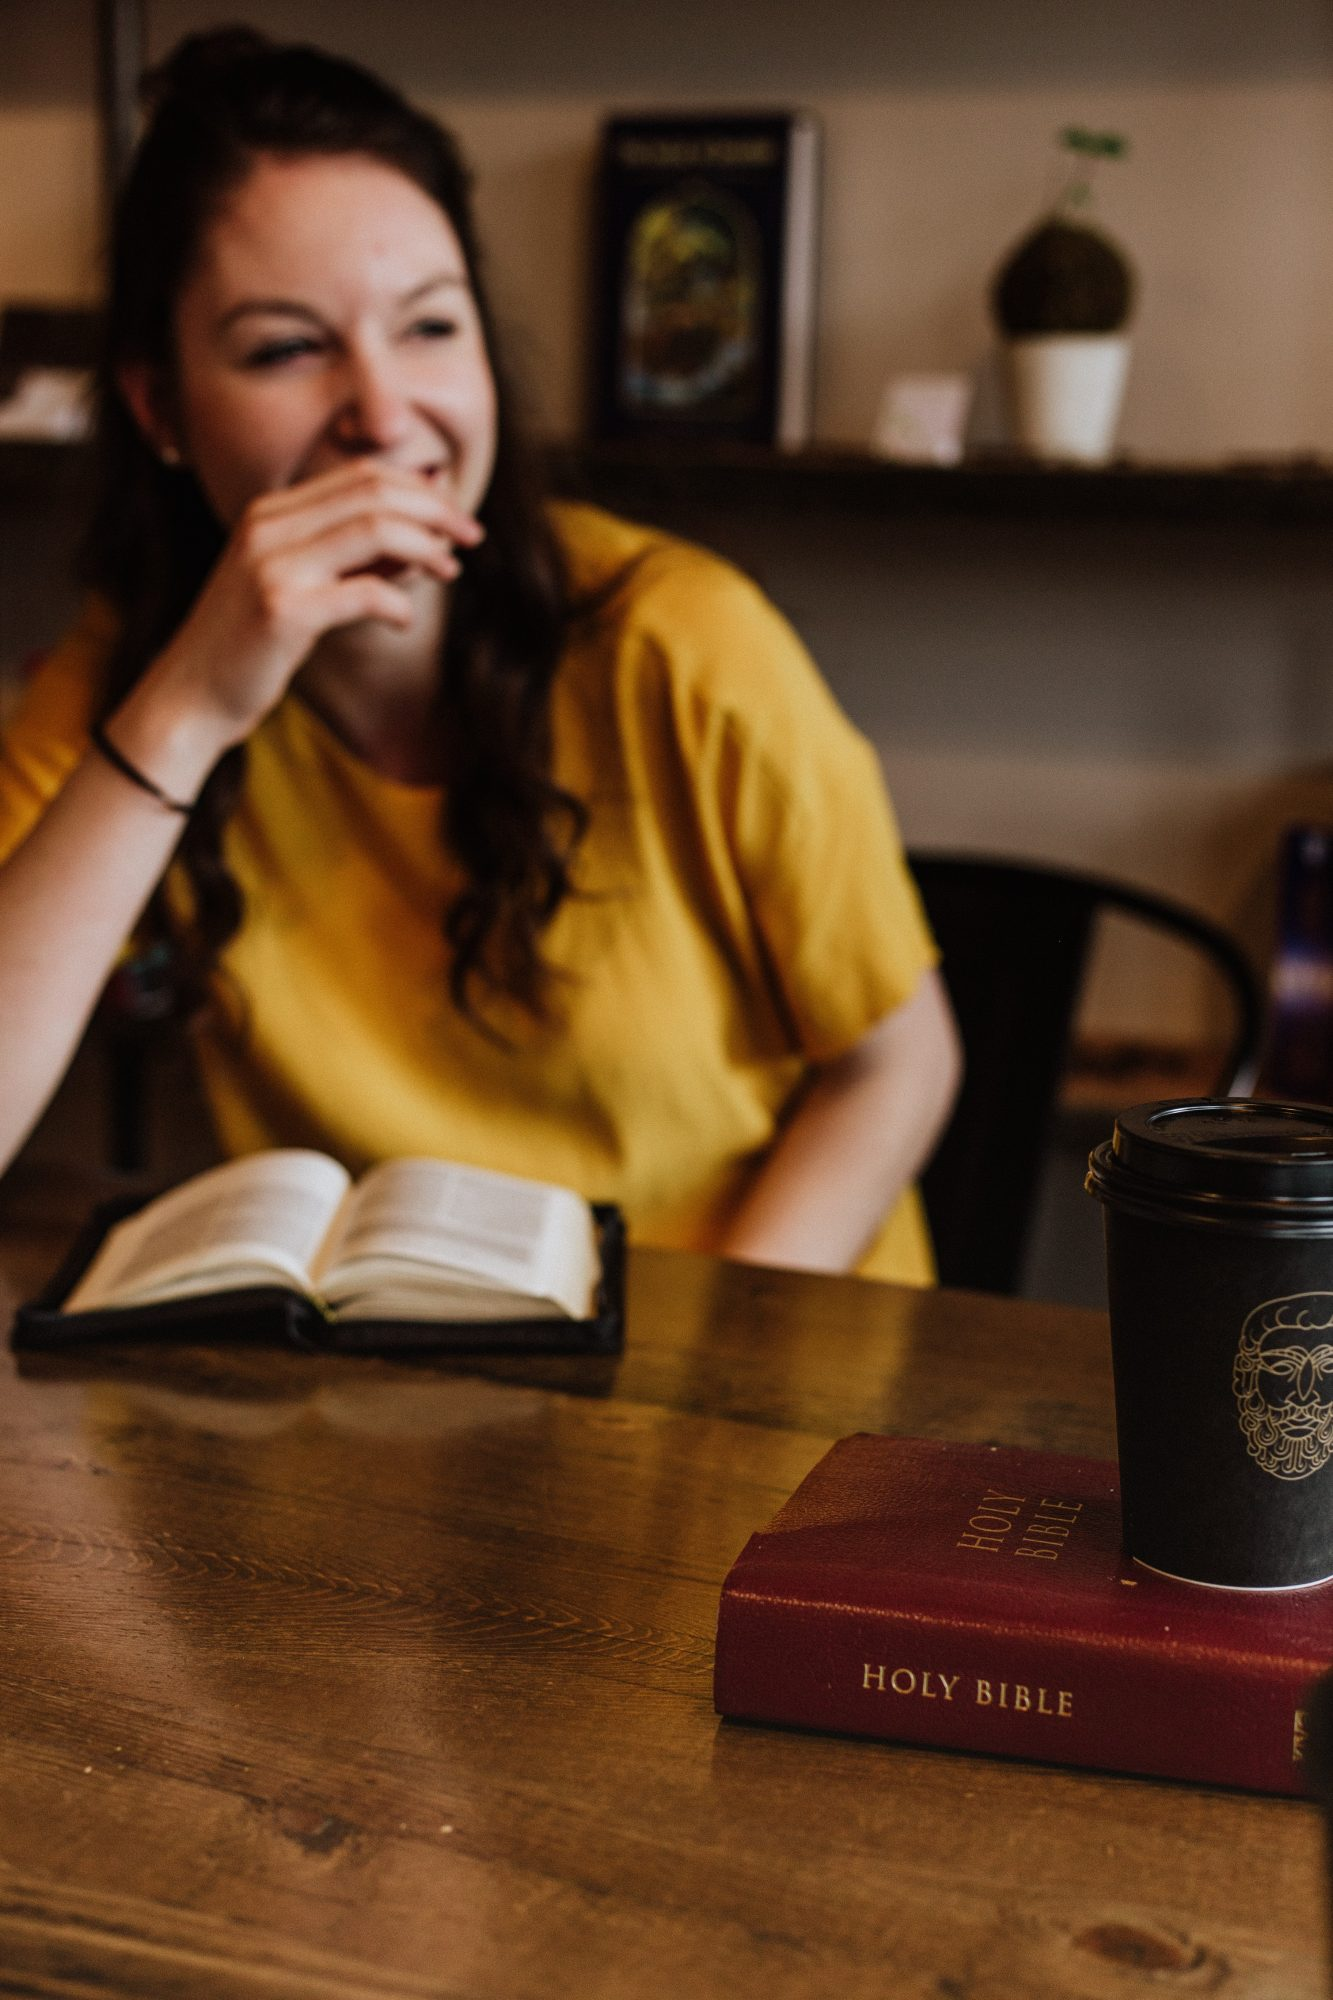 Frau mit Bibel und Kaffee